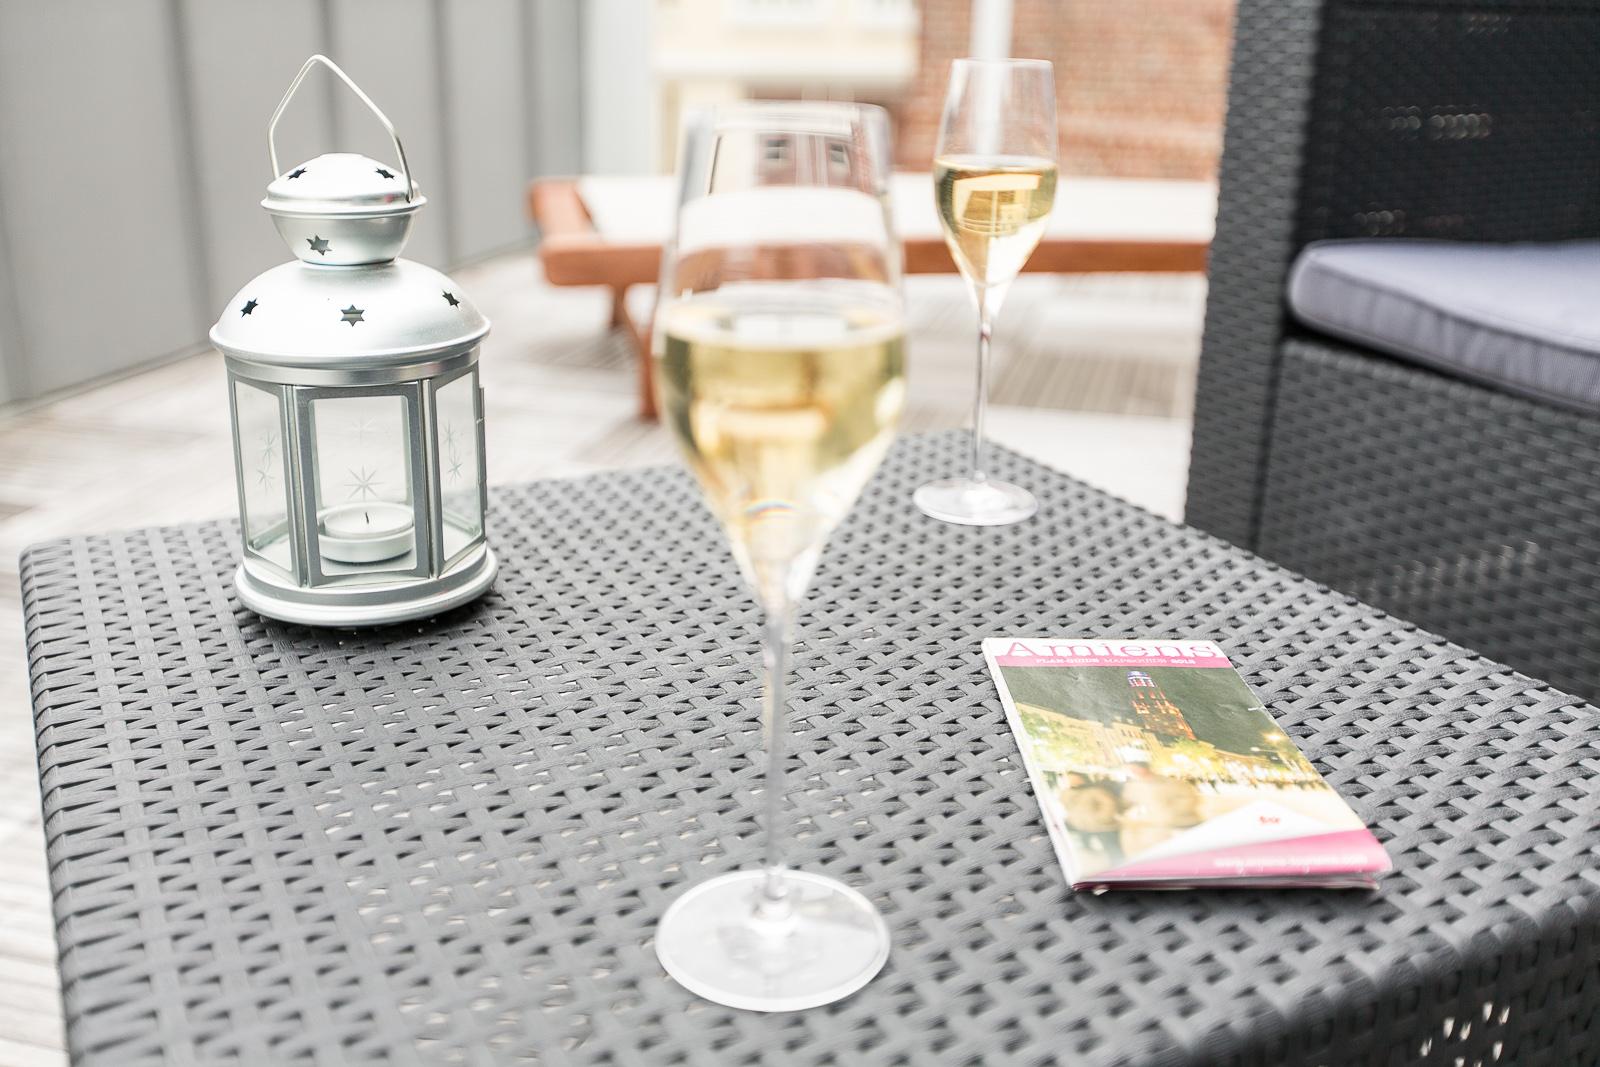 Hôtel Marotte - appartement champagne